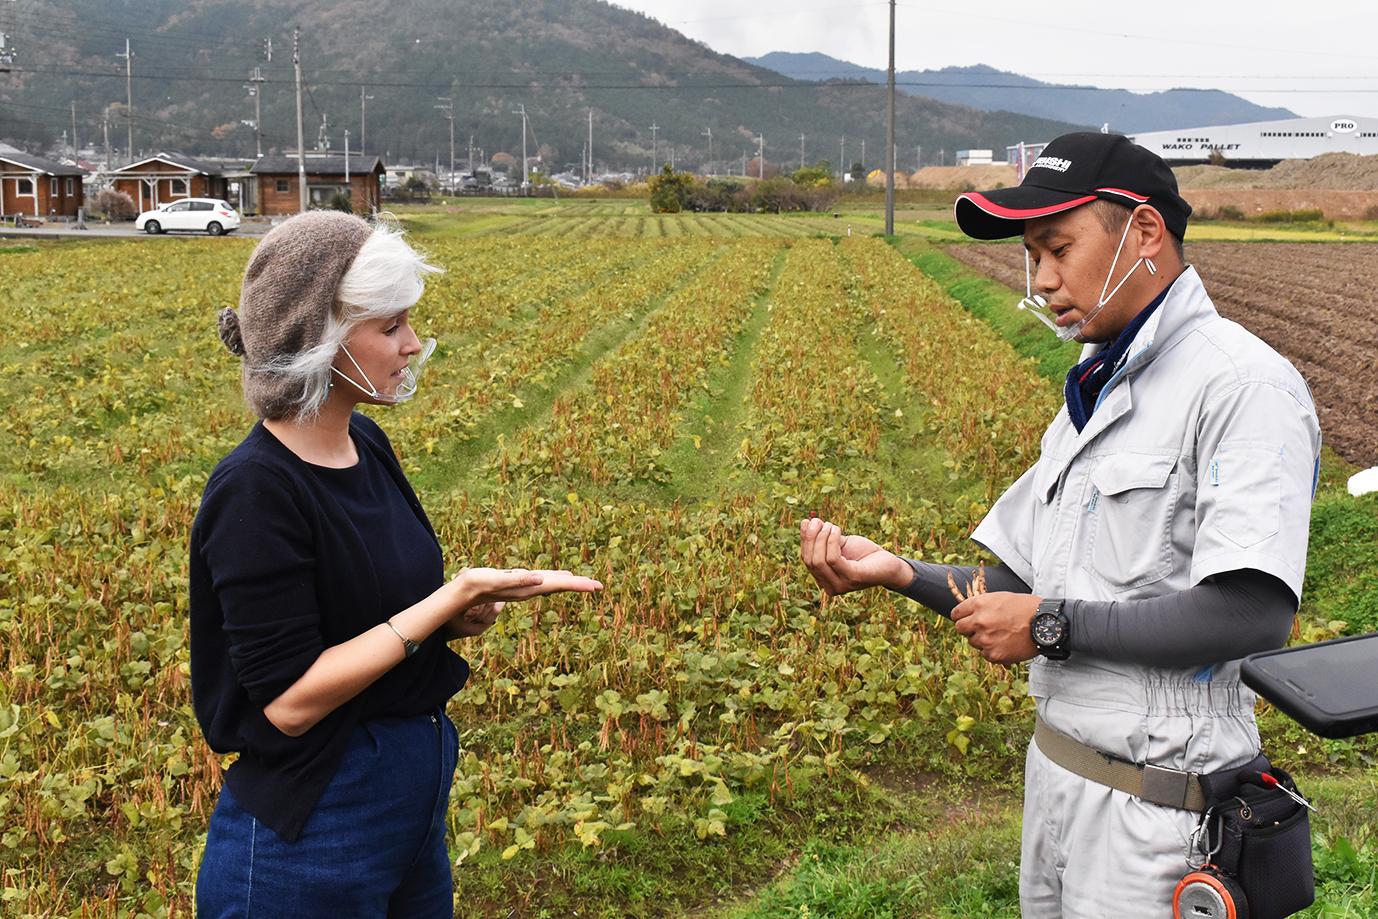 NHKで丹波大納言小豆を紹介 丹波大納言小豆を世界へPR